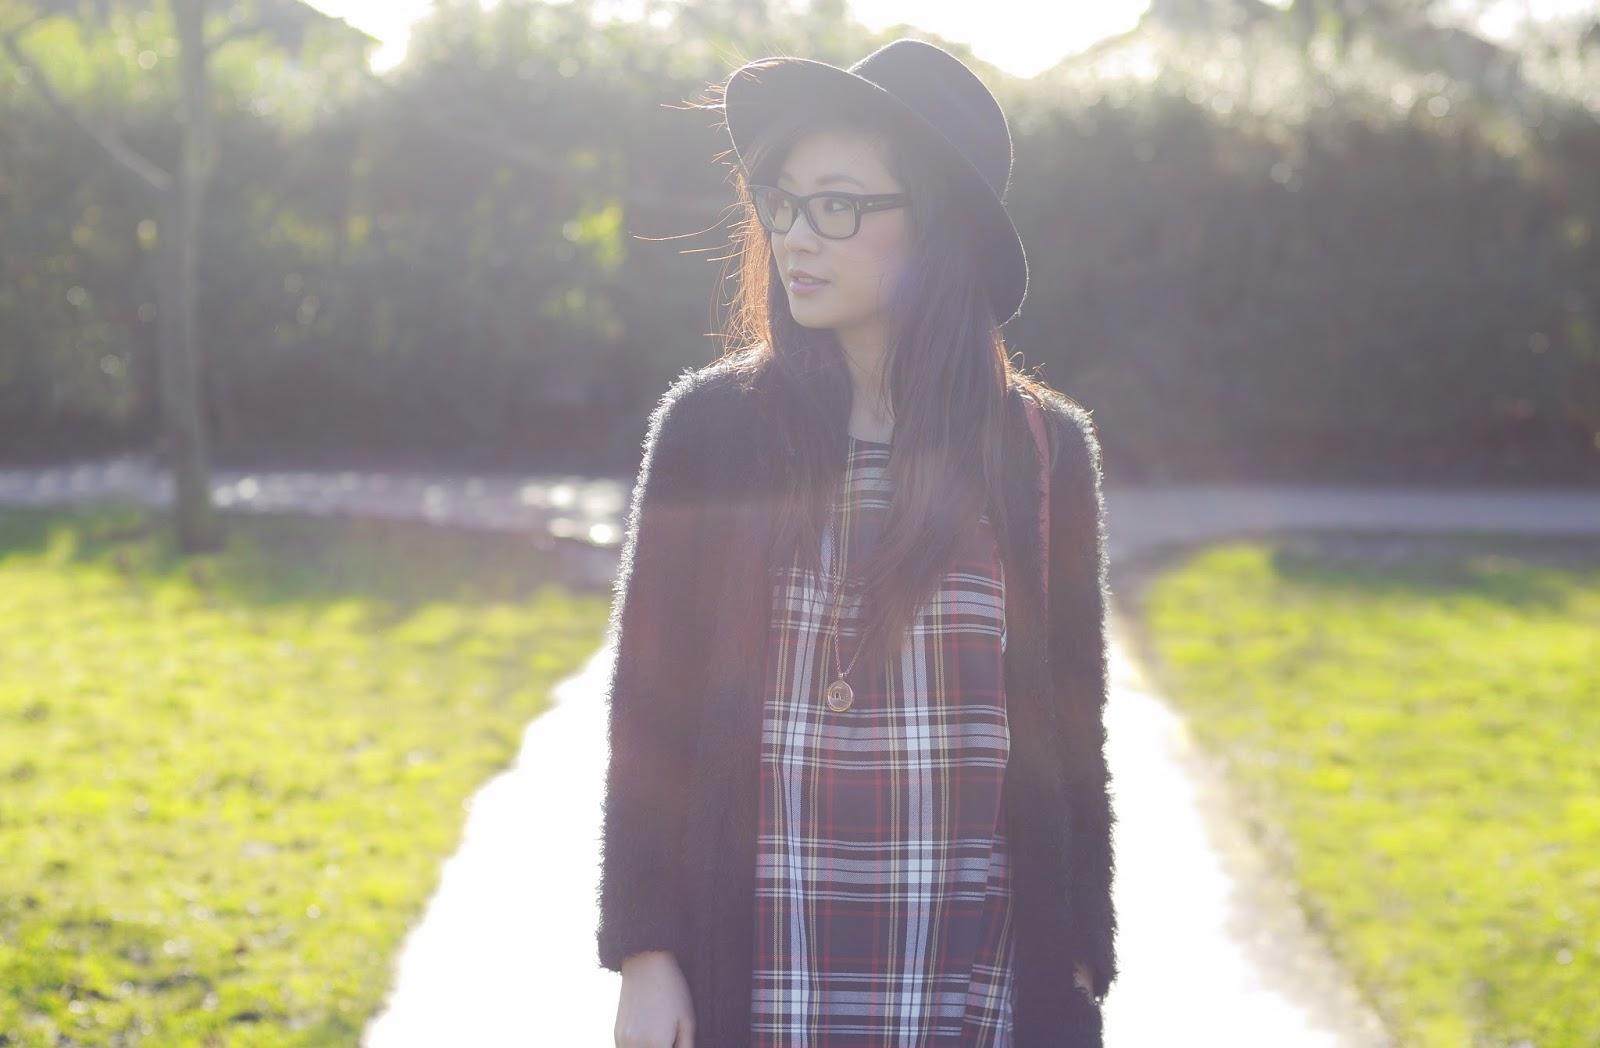 Ways to wear a tartan dress, styling a tartan dress